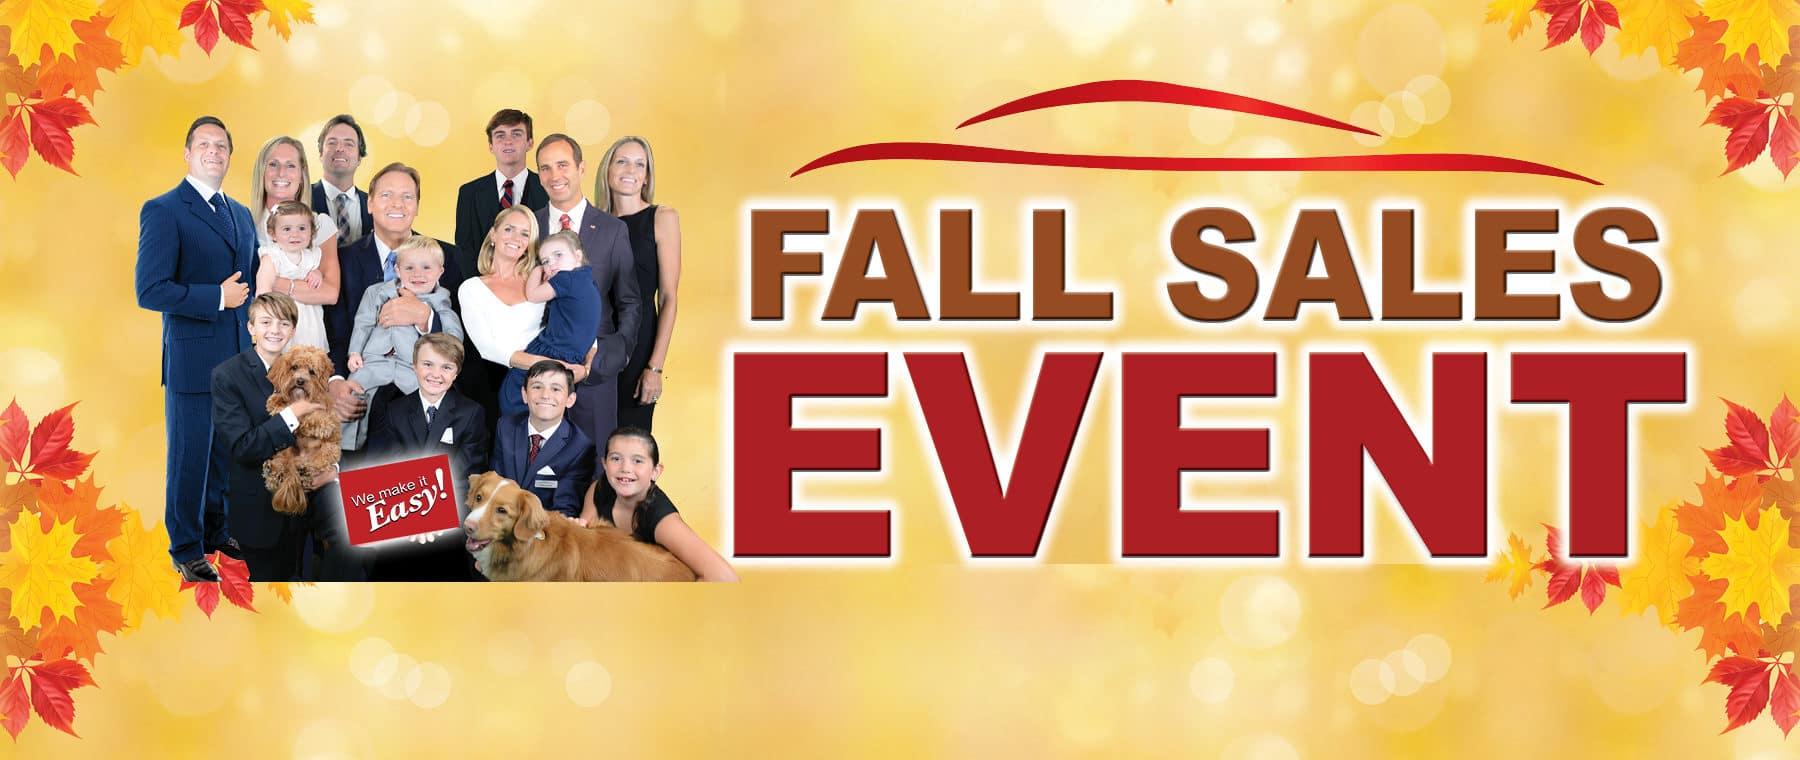 Kelly Honda Fall Sales Event